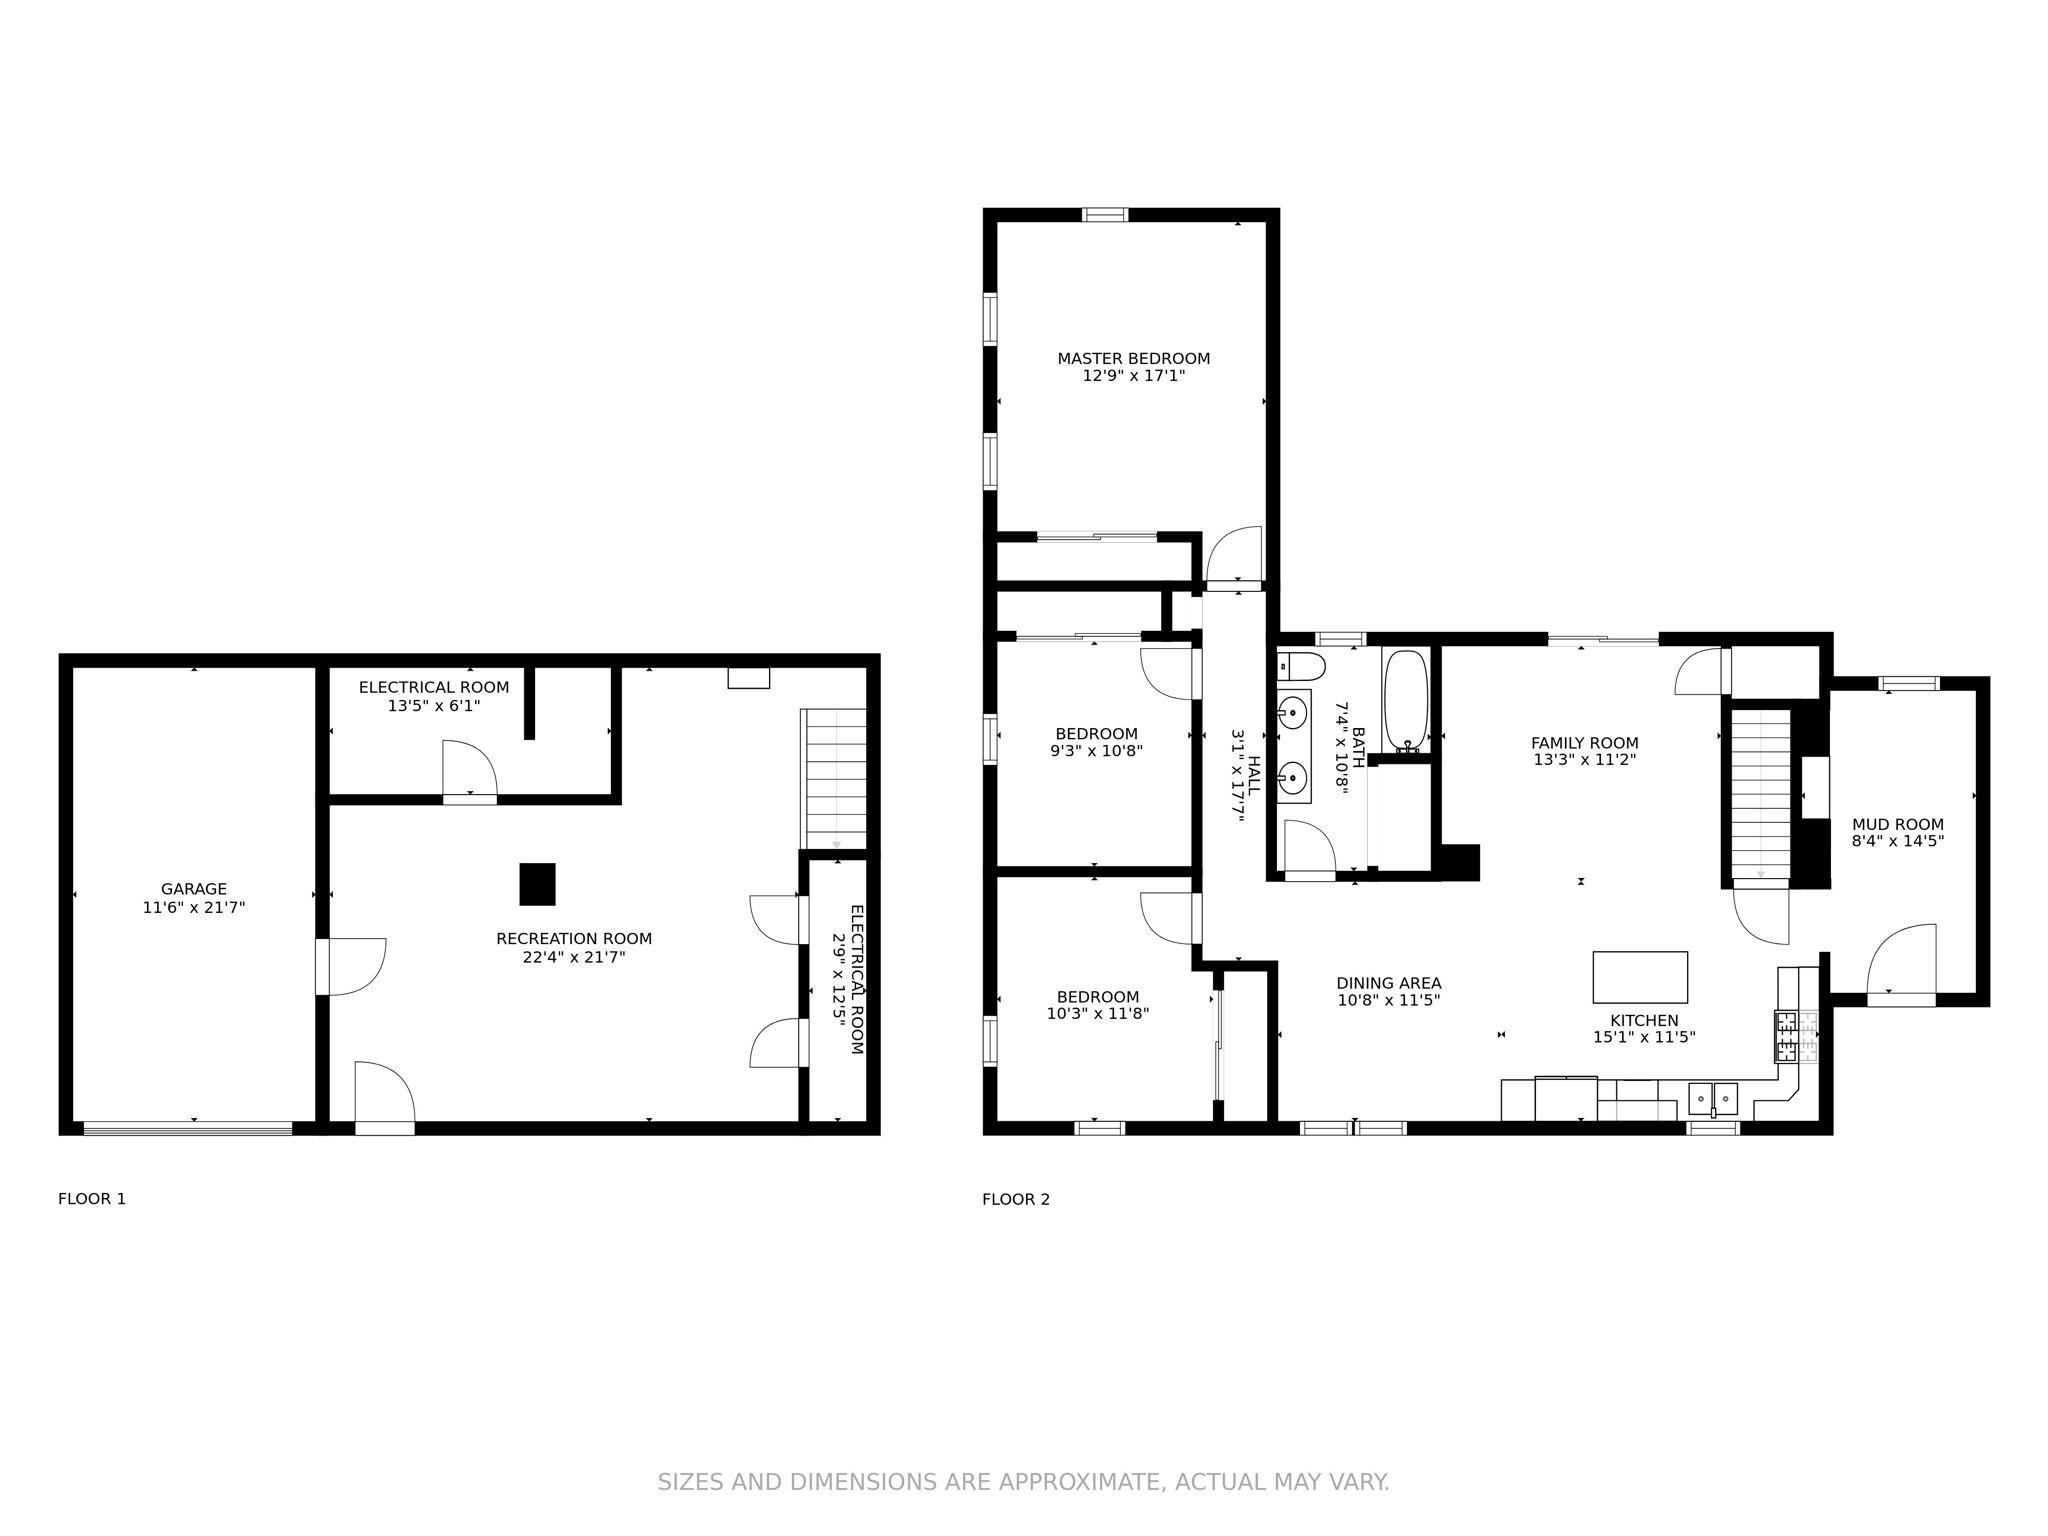 All-In-One Dimensions - 4 Prescott Rd